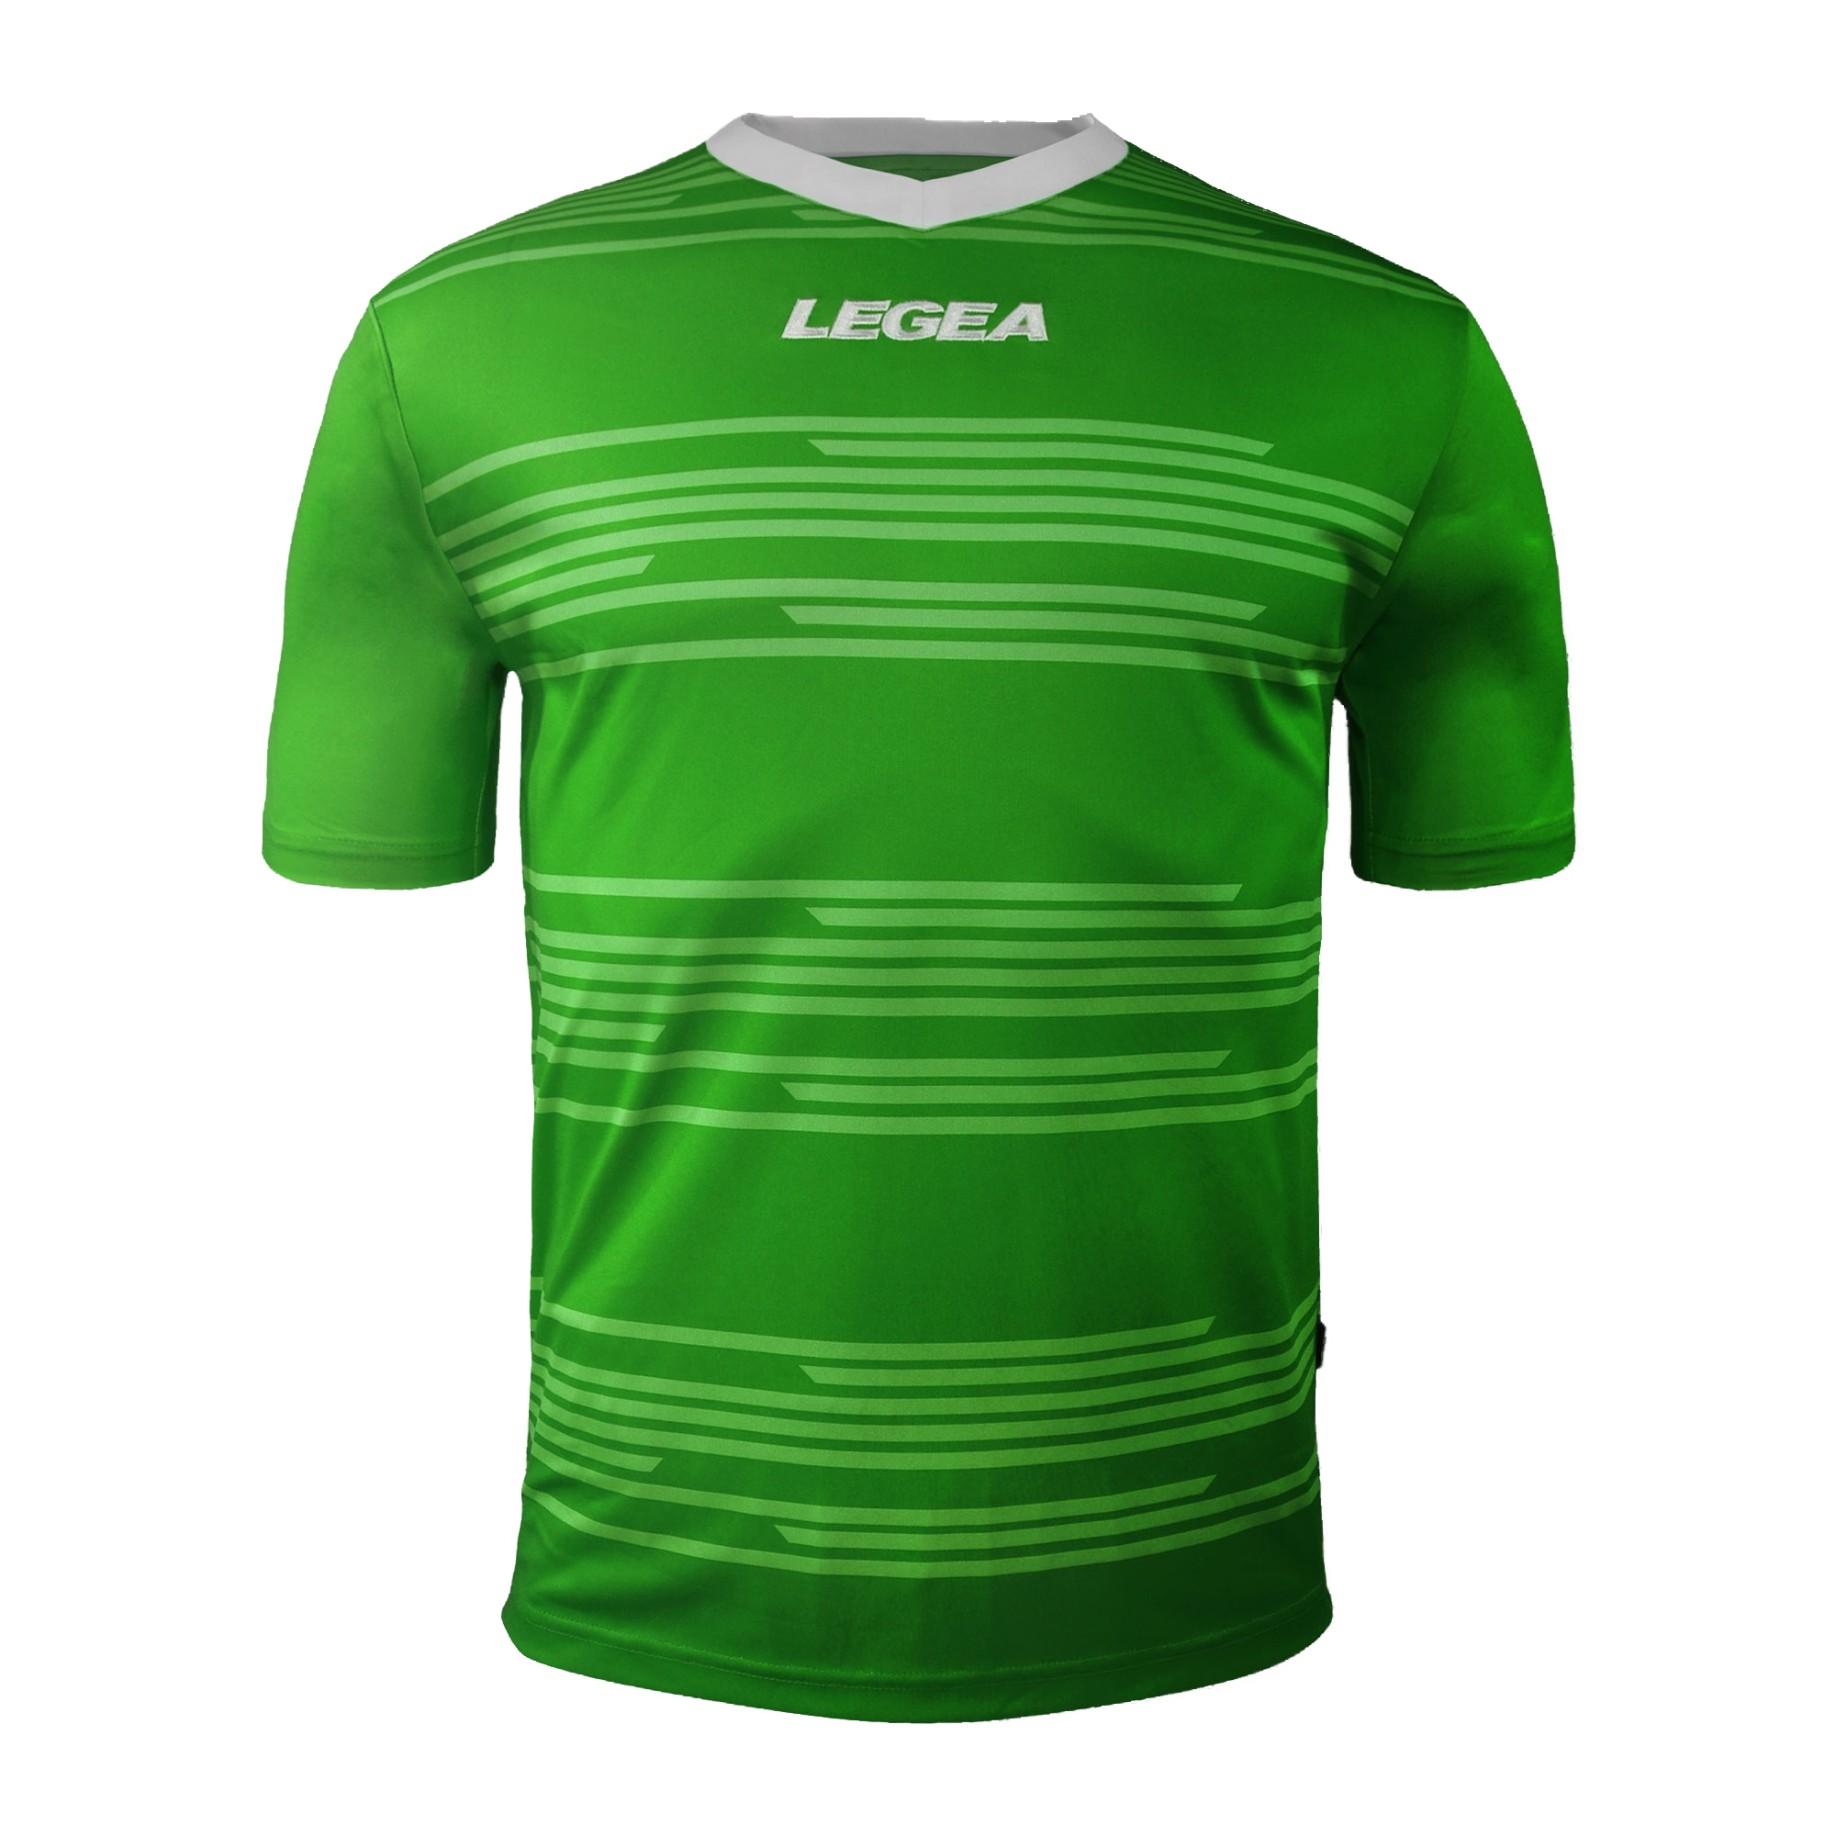 Legea Ankara Camiseta Fútbol De Mc CeordxBW